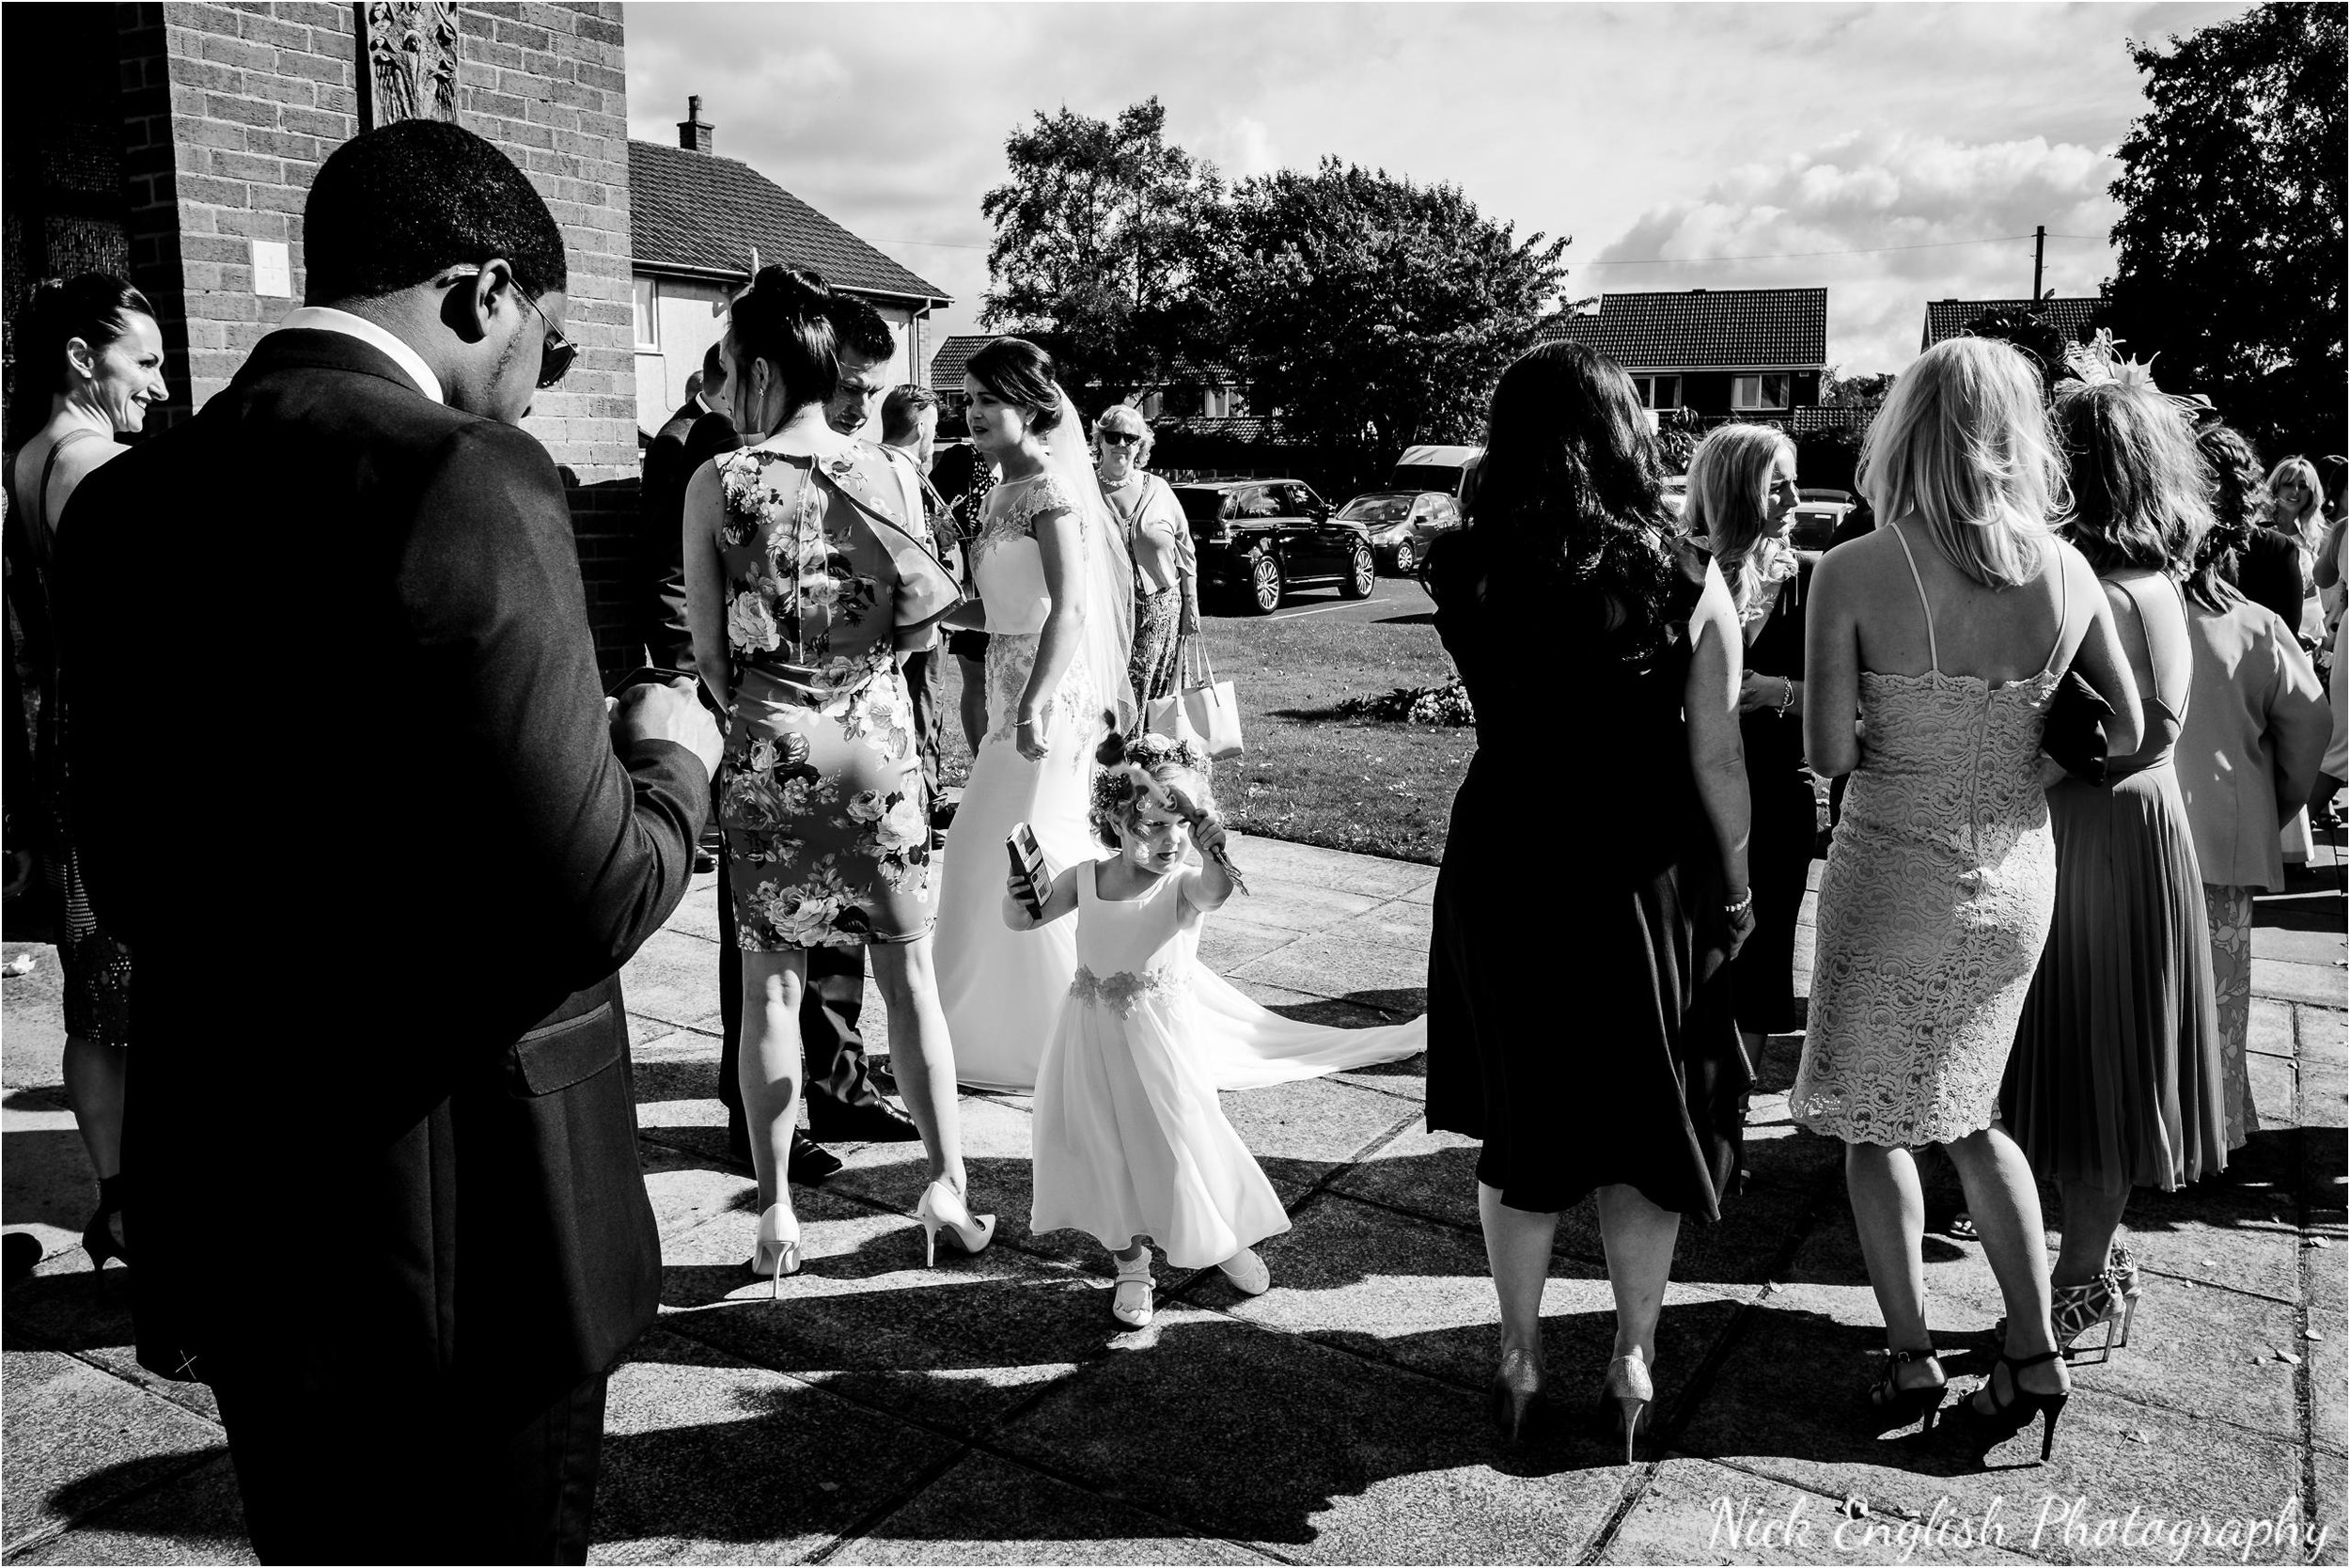 Stacey-Ash-Wedding-Photographs-Stanley-House-Preston-Lancashire-91.jpg